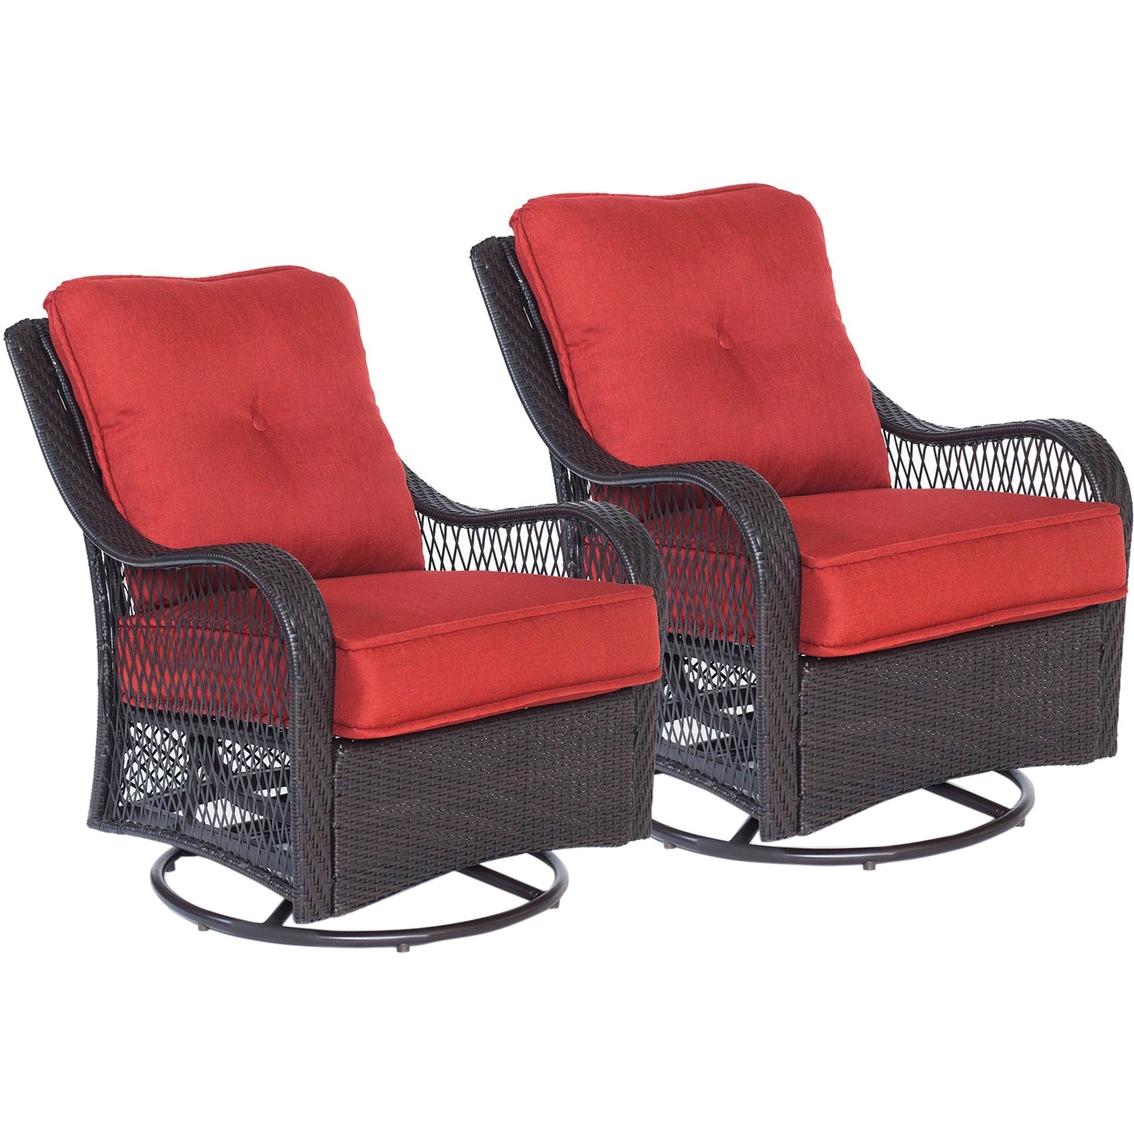 Peachy Hanover Orleans Swivel Rocking Chairs 2 Pk Patio Sets Cjindustries Chair Design For Home Cjindustriesco